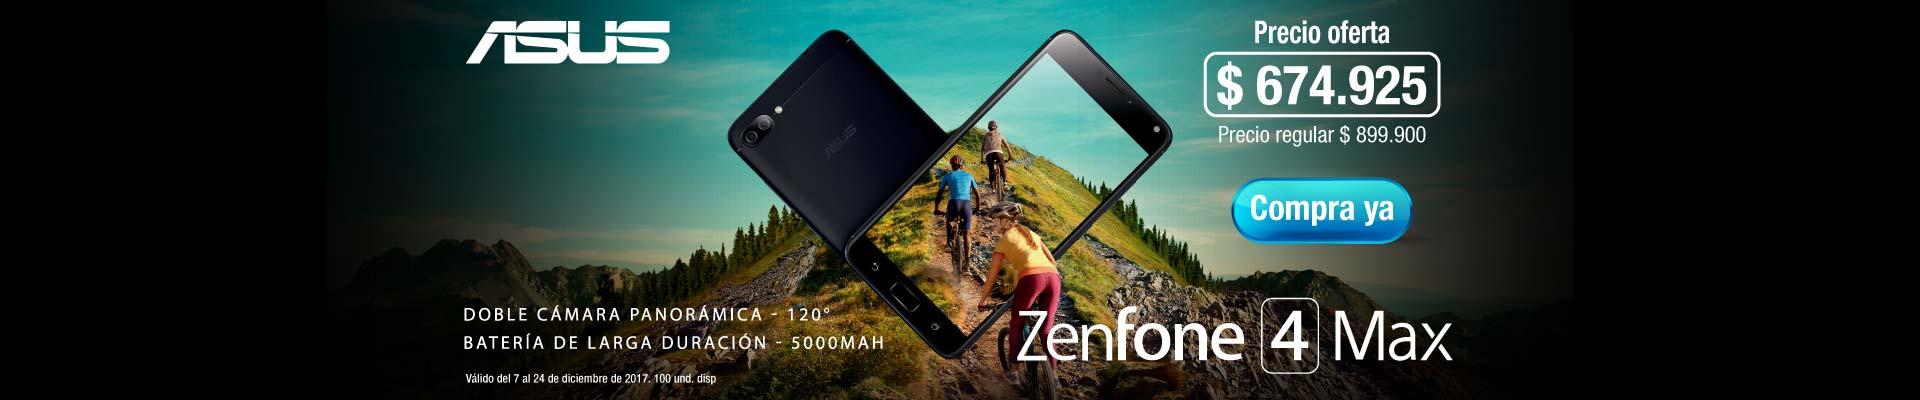 EXP AK ASUS - PPAL-10-celulares-Zenfone4Max-cat-diciembre-14-17